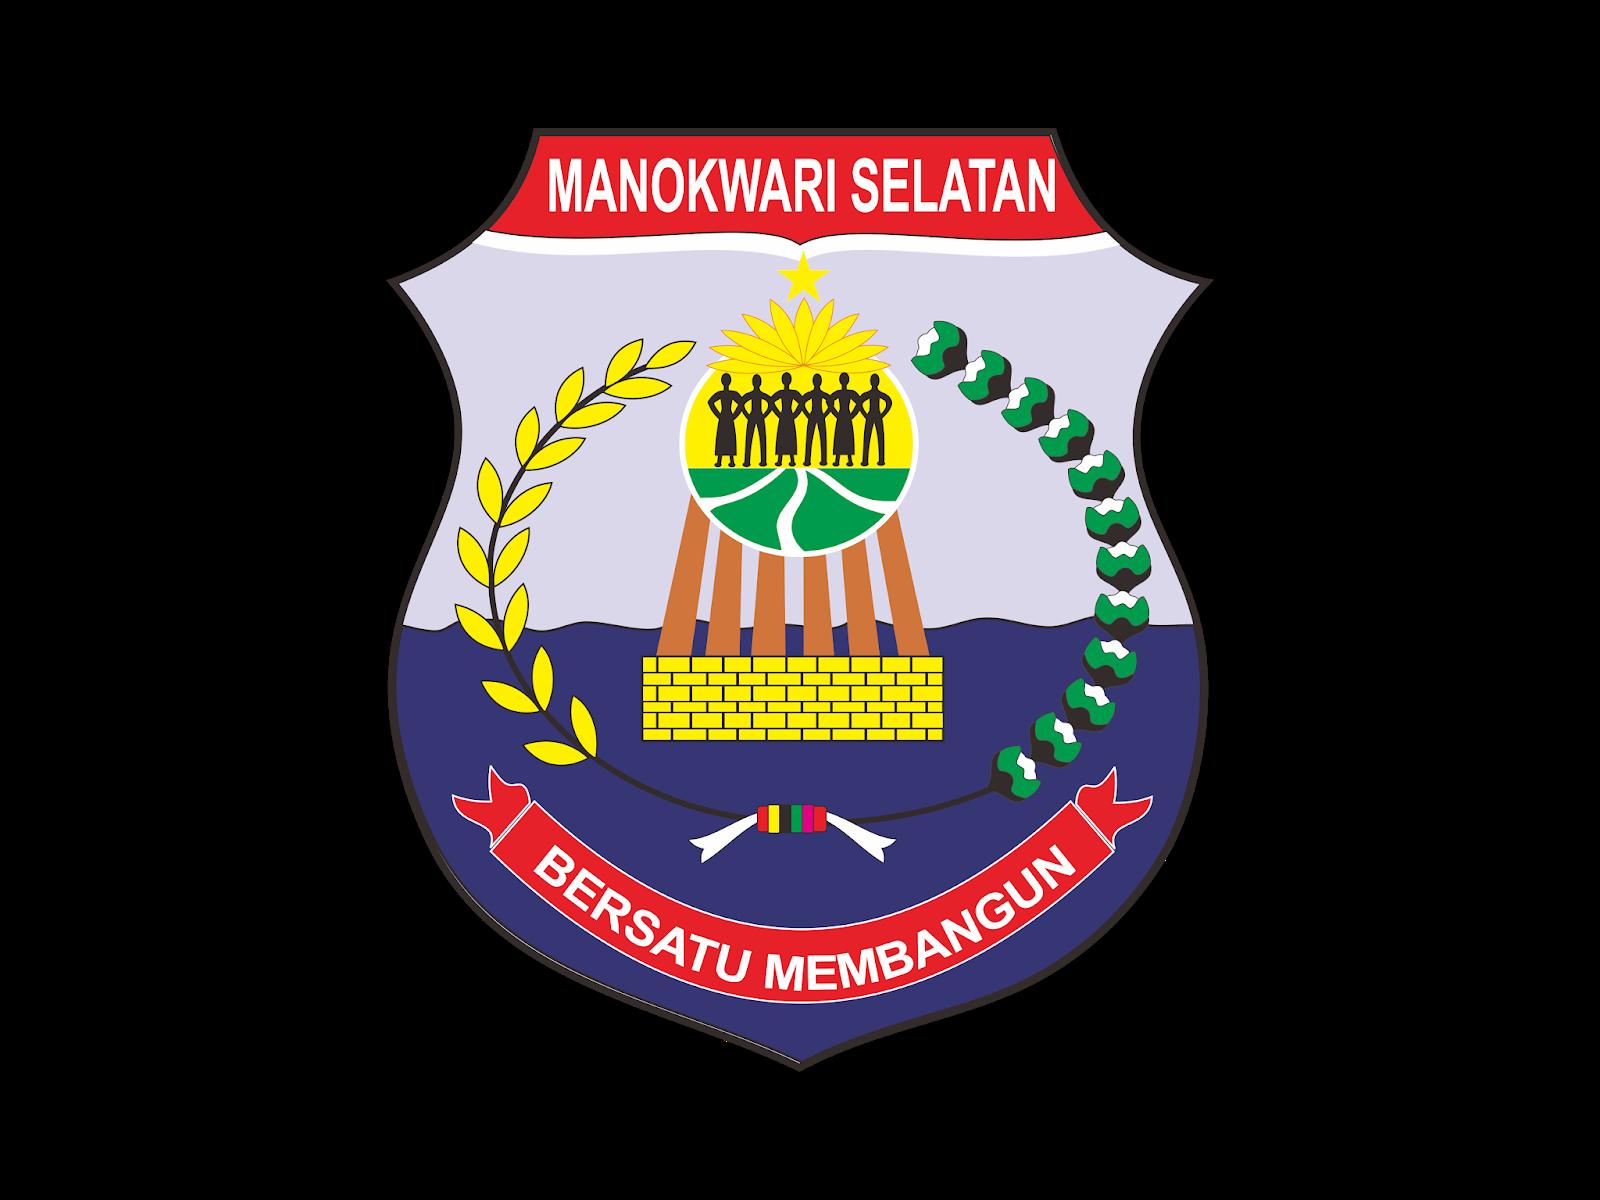 Logo Kabupaten Manokwari Selatan Vector Format Cdr Png Svg Ai Biologizone